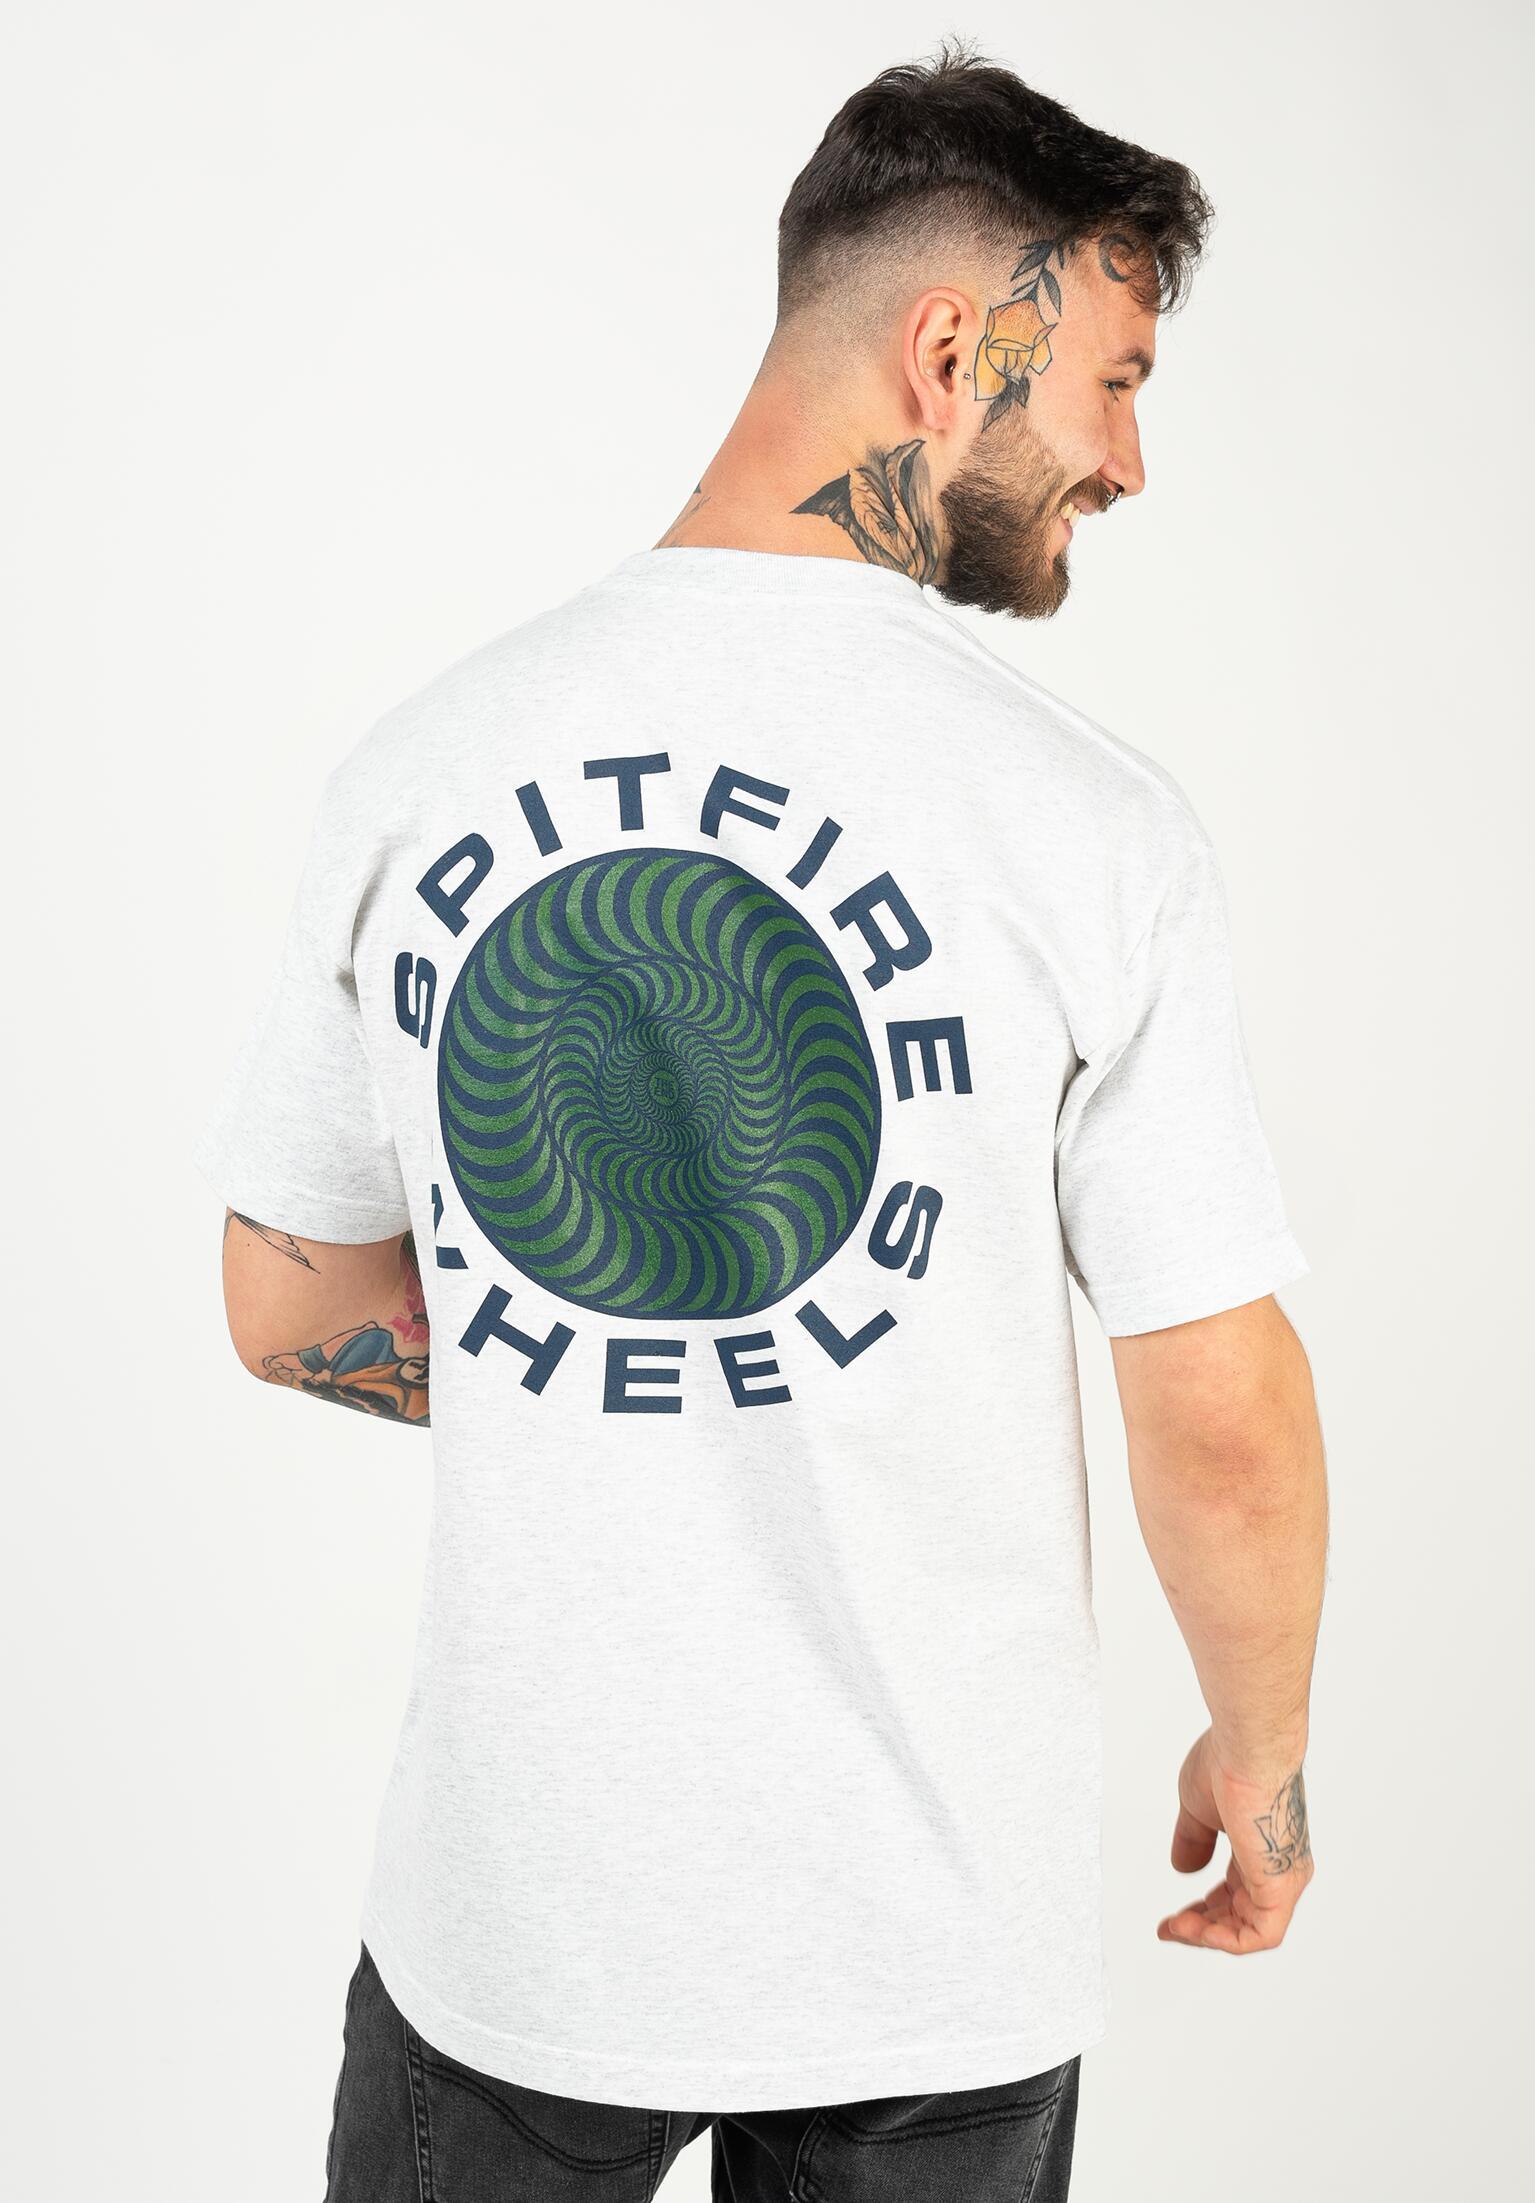 Spitfire Skateboards Pullover Hoody Classic 87 Swirl Navy//White